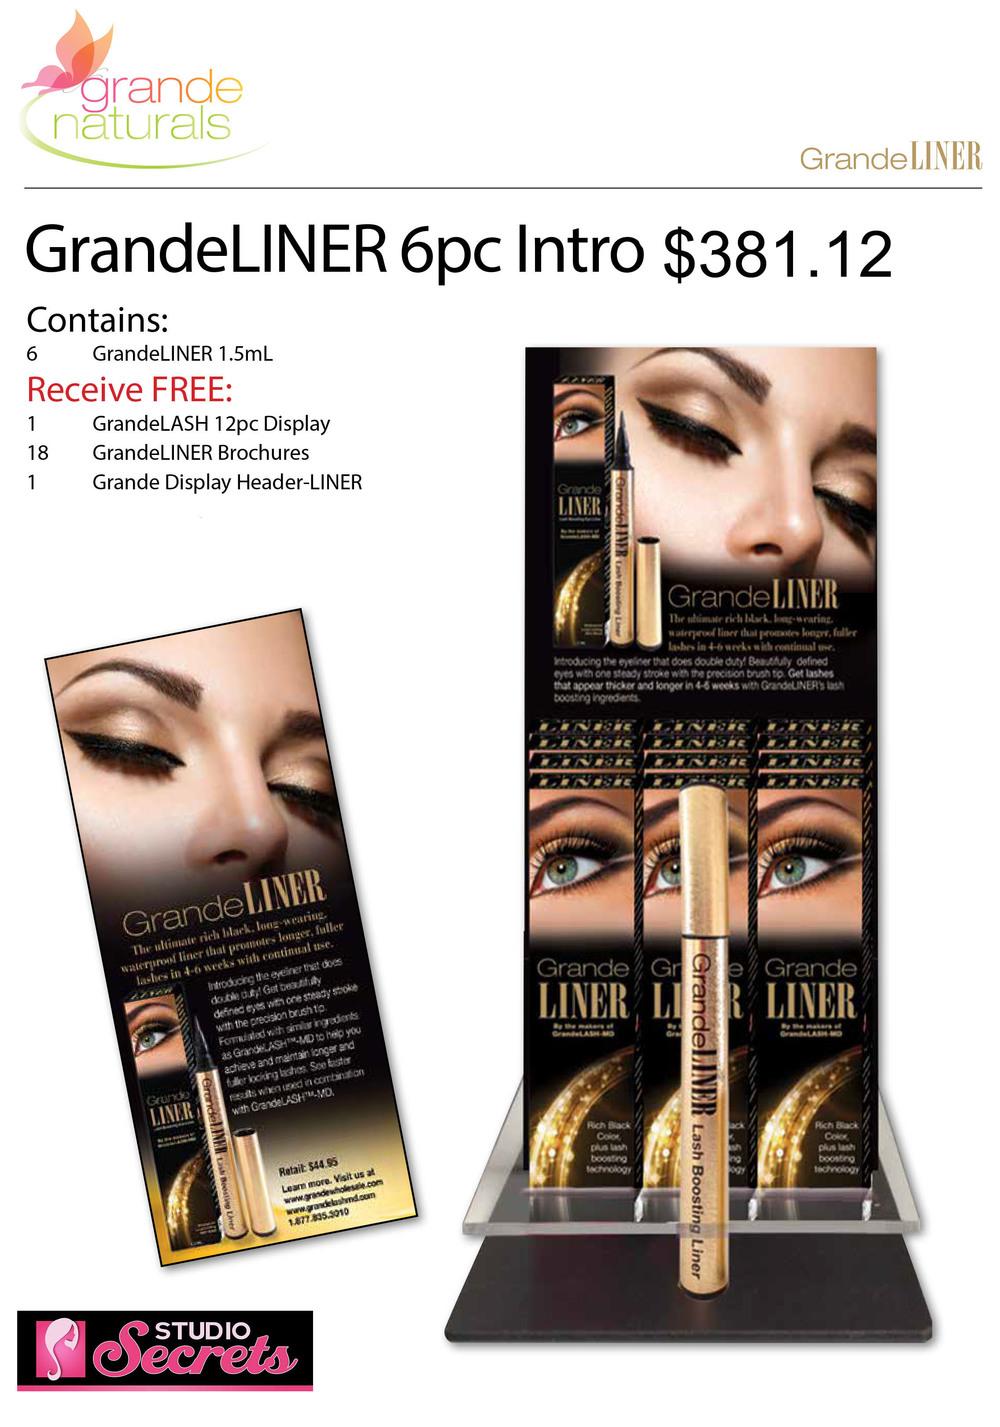 GrandeLINER 6pc Intro